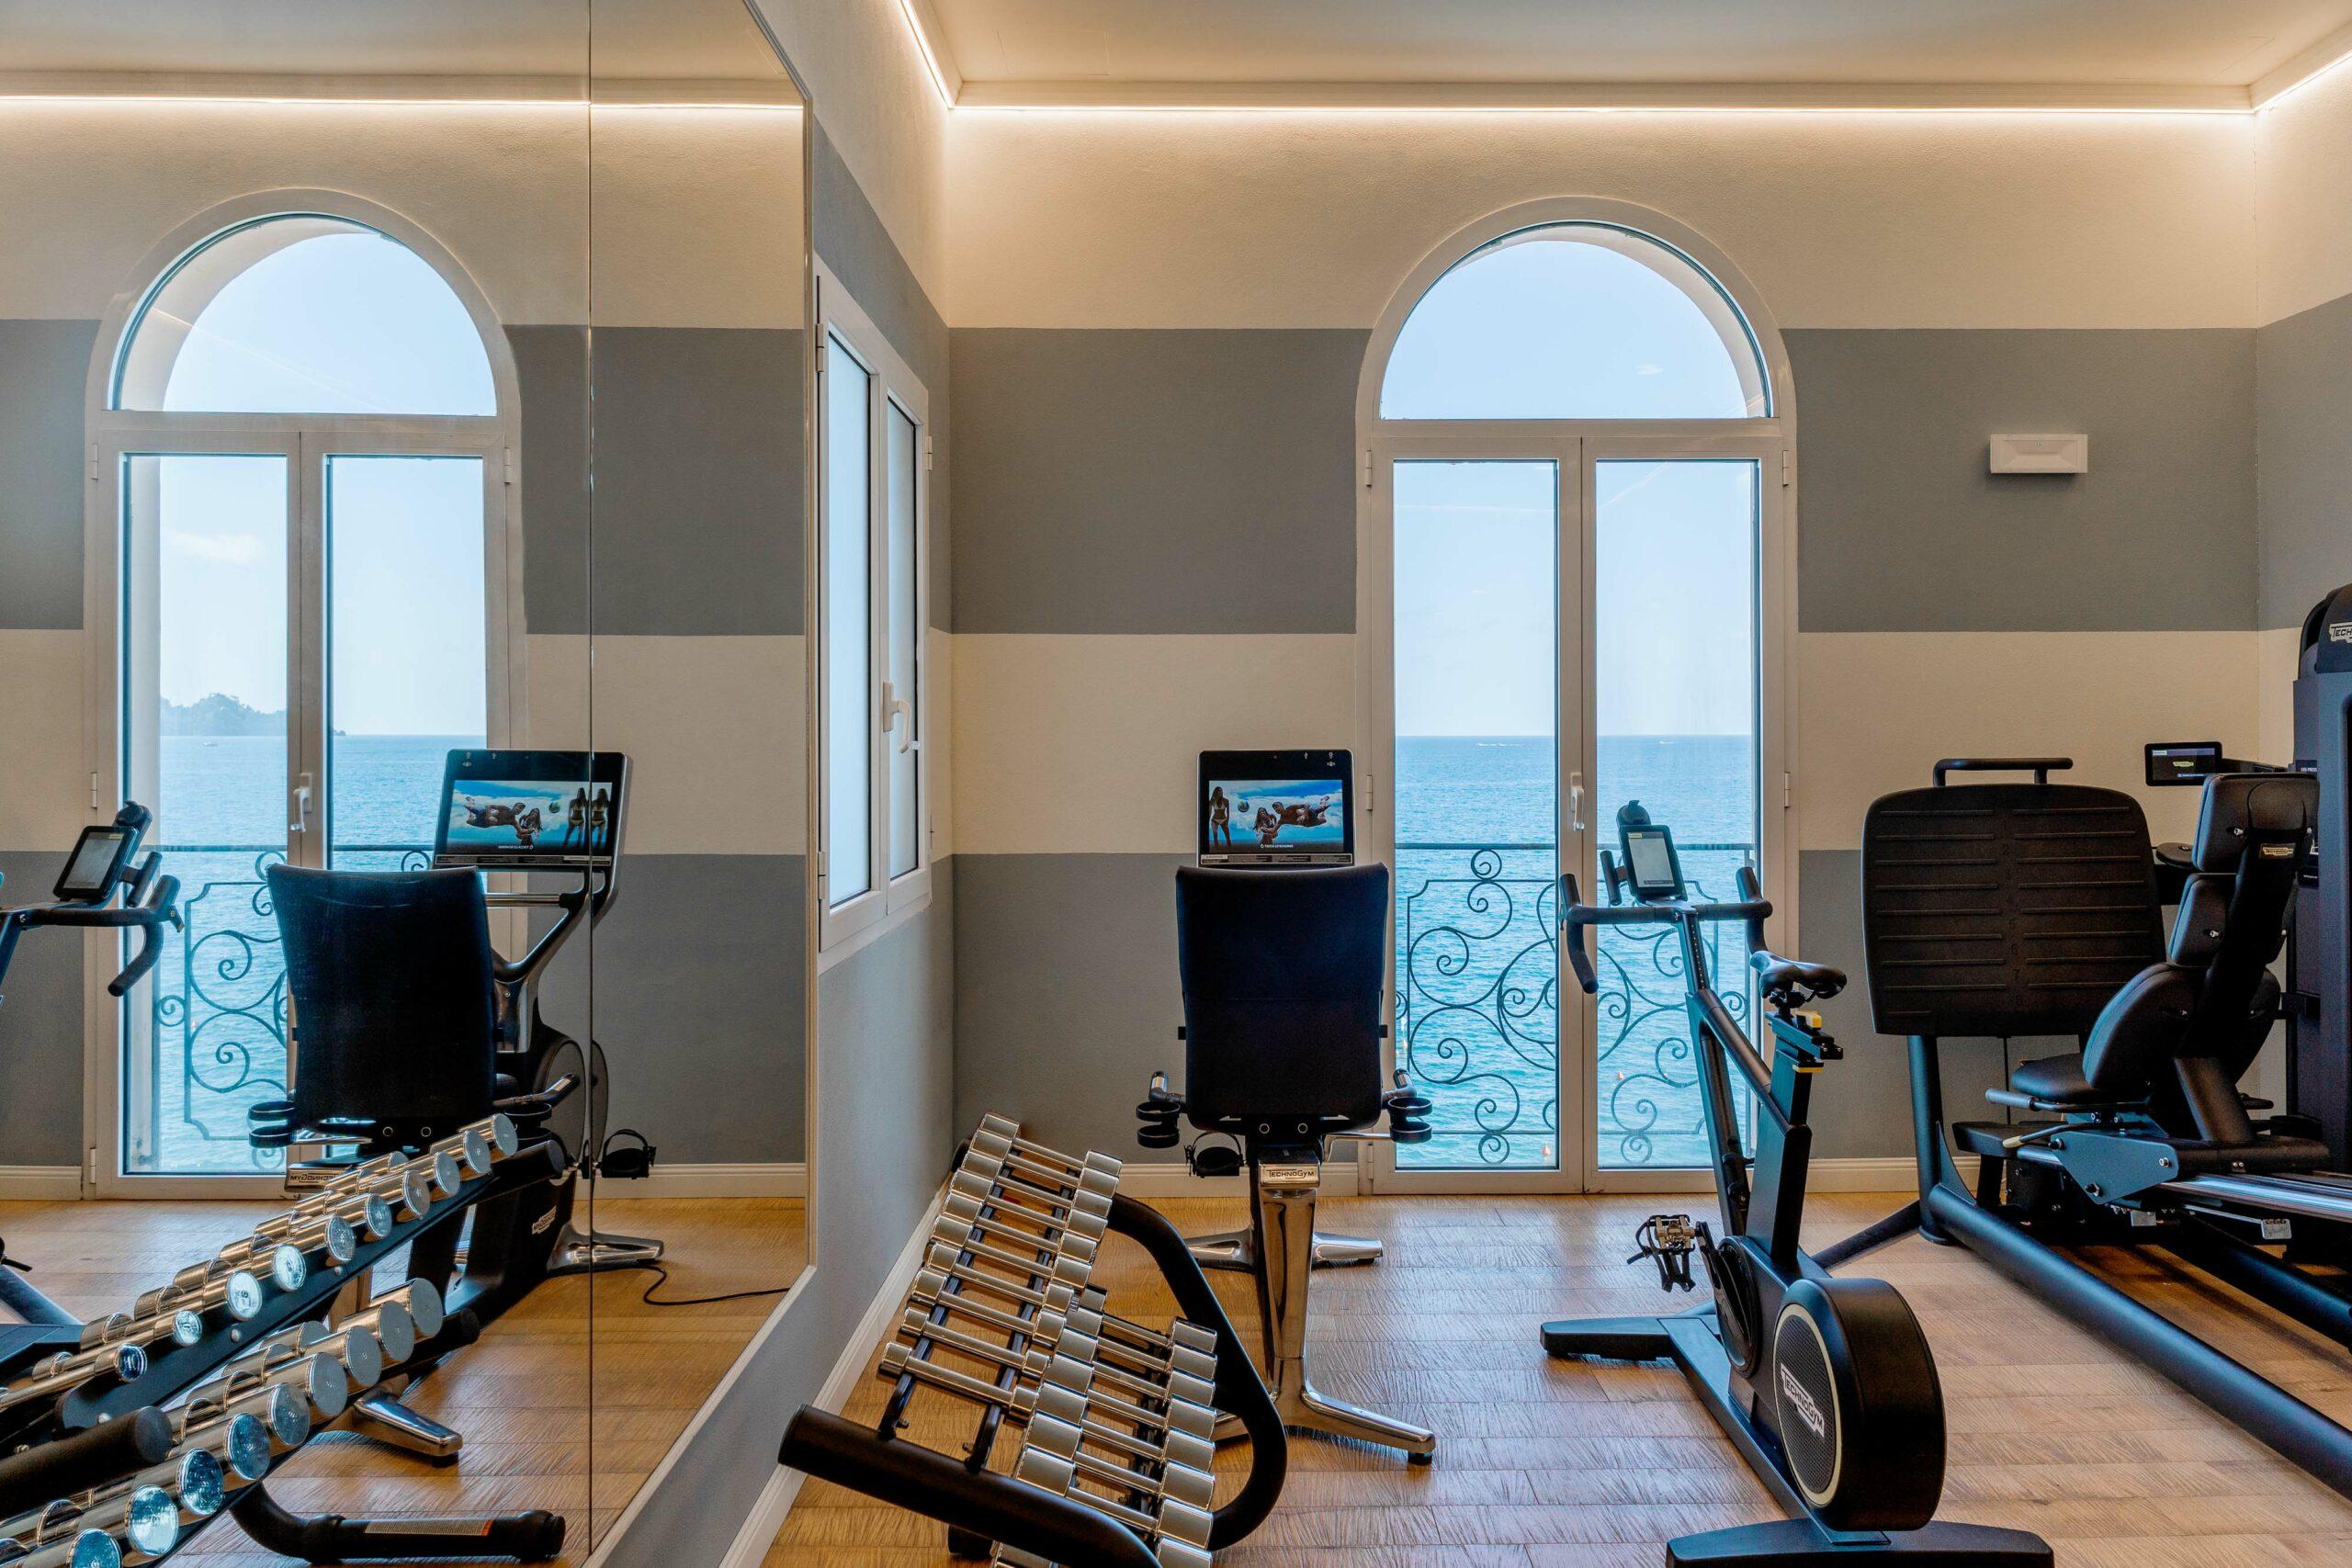 Hotel-Excelsior-Rapallo_Immodrone_Gym2